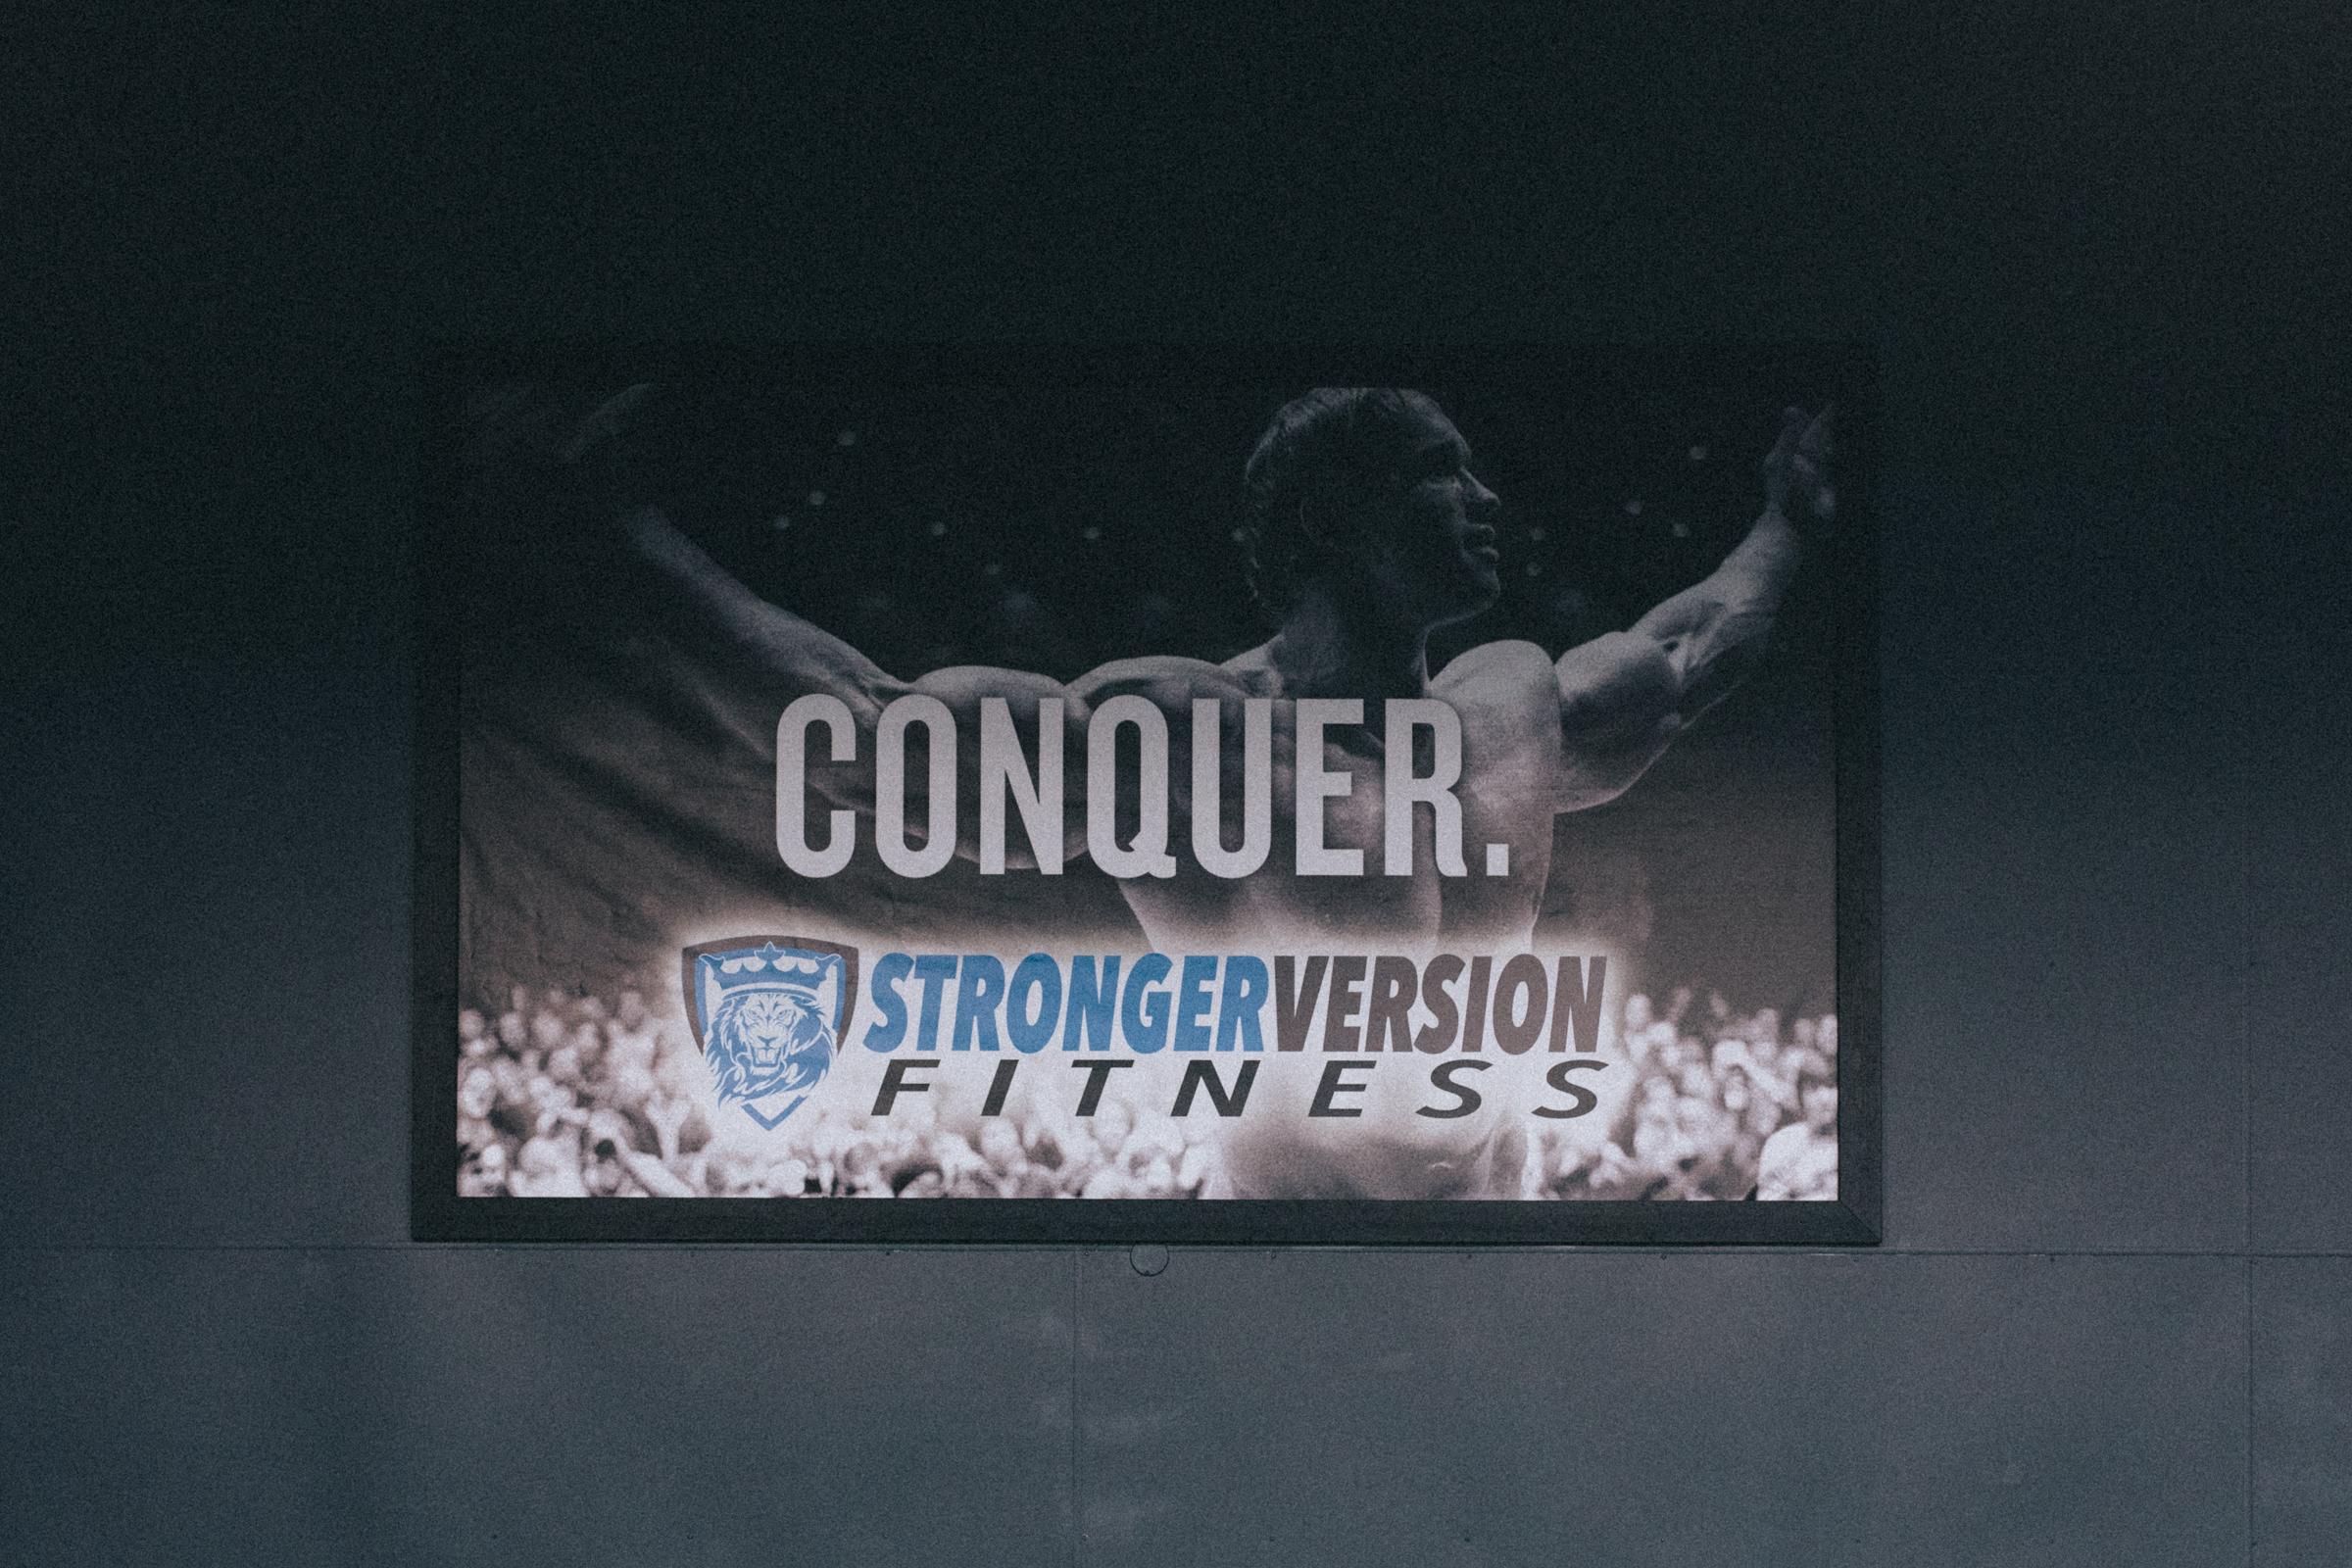 001-Stronger.Version.Fitness.Gym.Shots.18-2.jpg